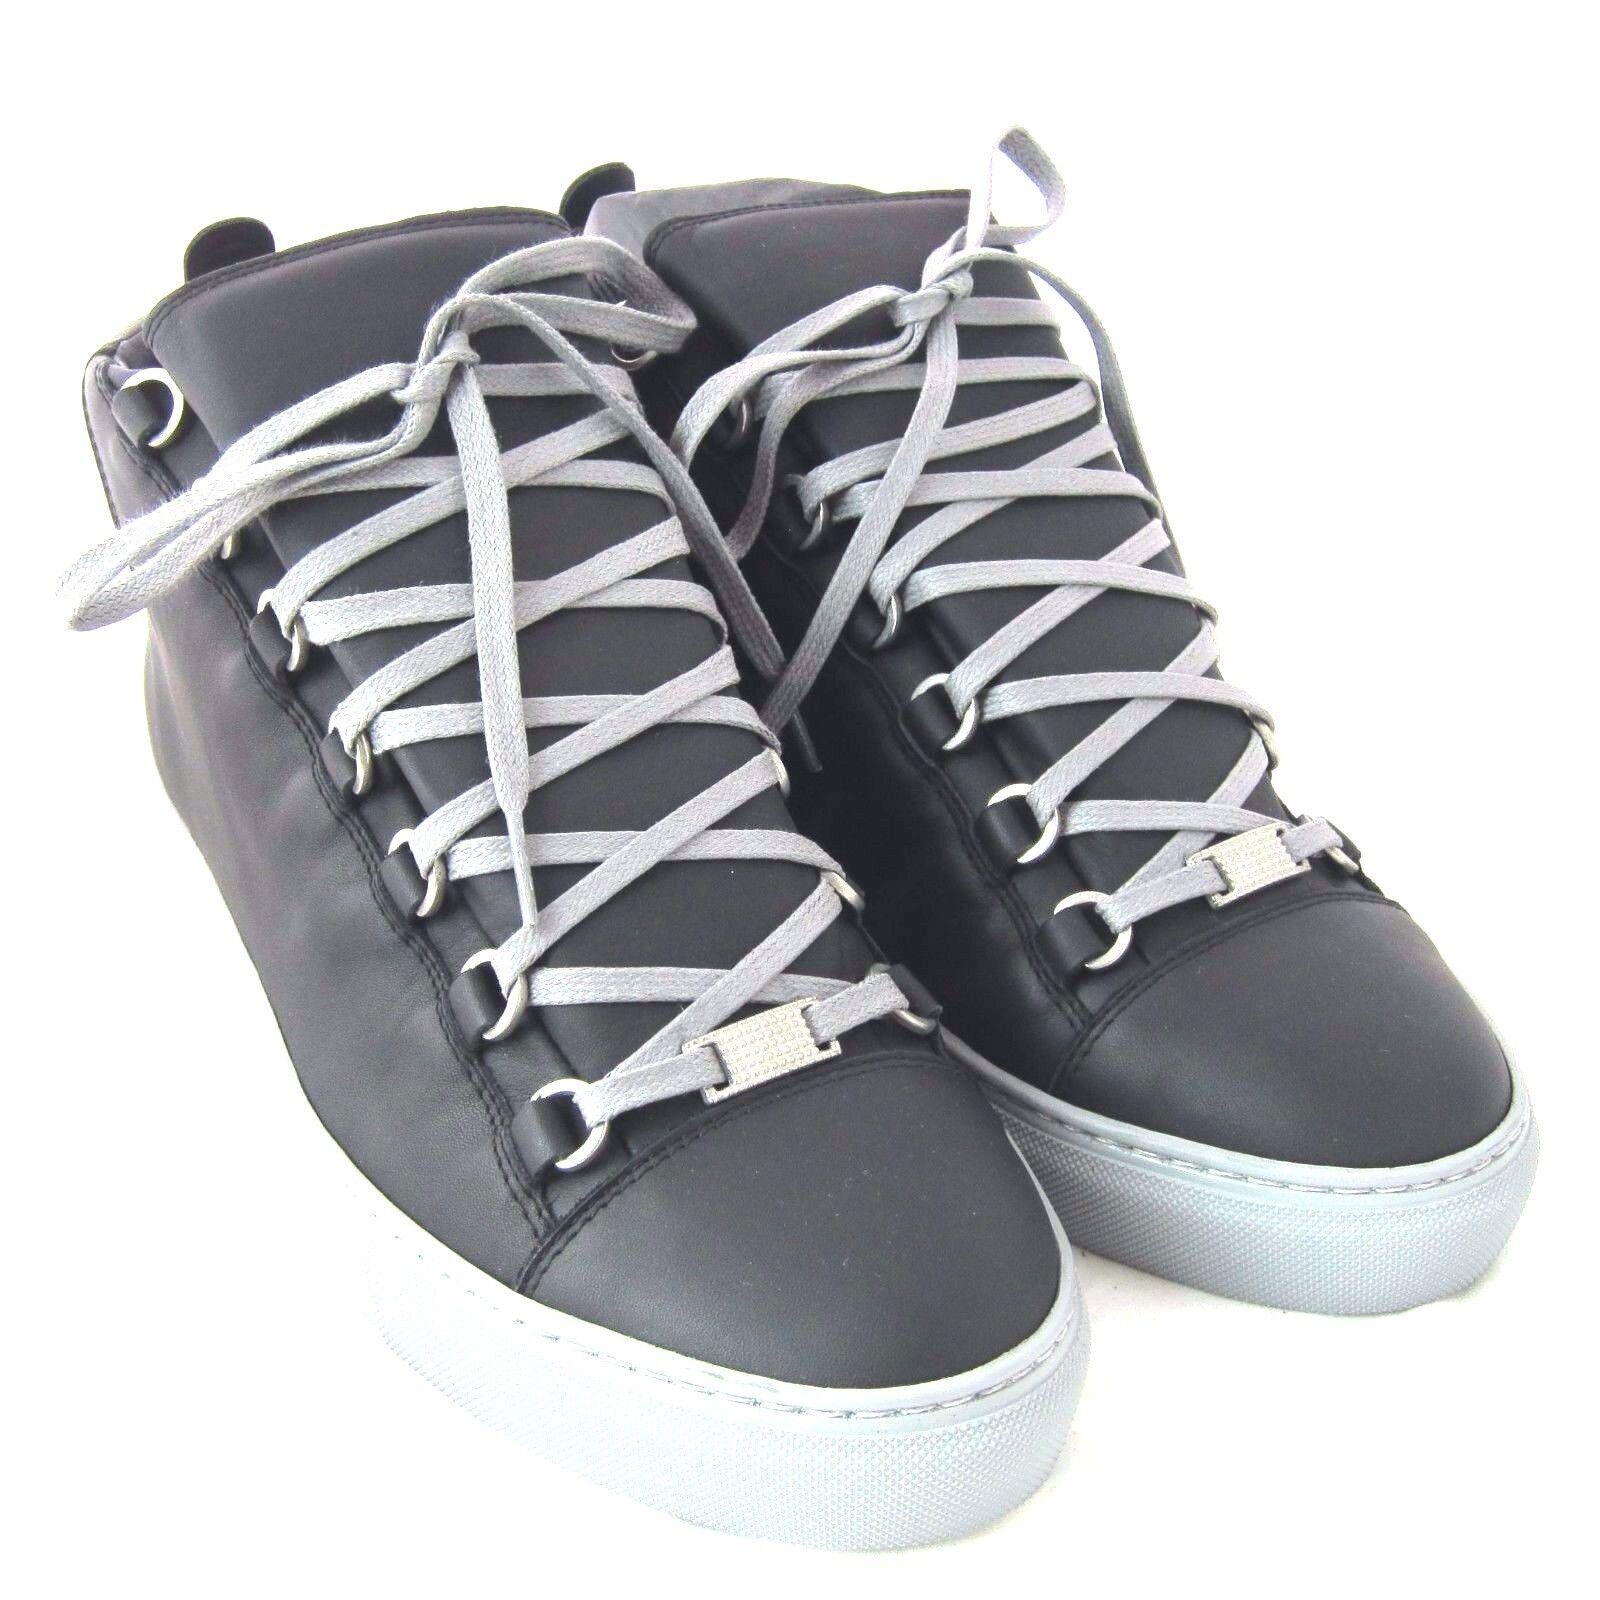 0d2ed2eb4b35b купить C 1630 Balenciaga Arena Leather, с доставкой K-BG11258B New  Balenciaga Ombre Mens